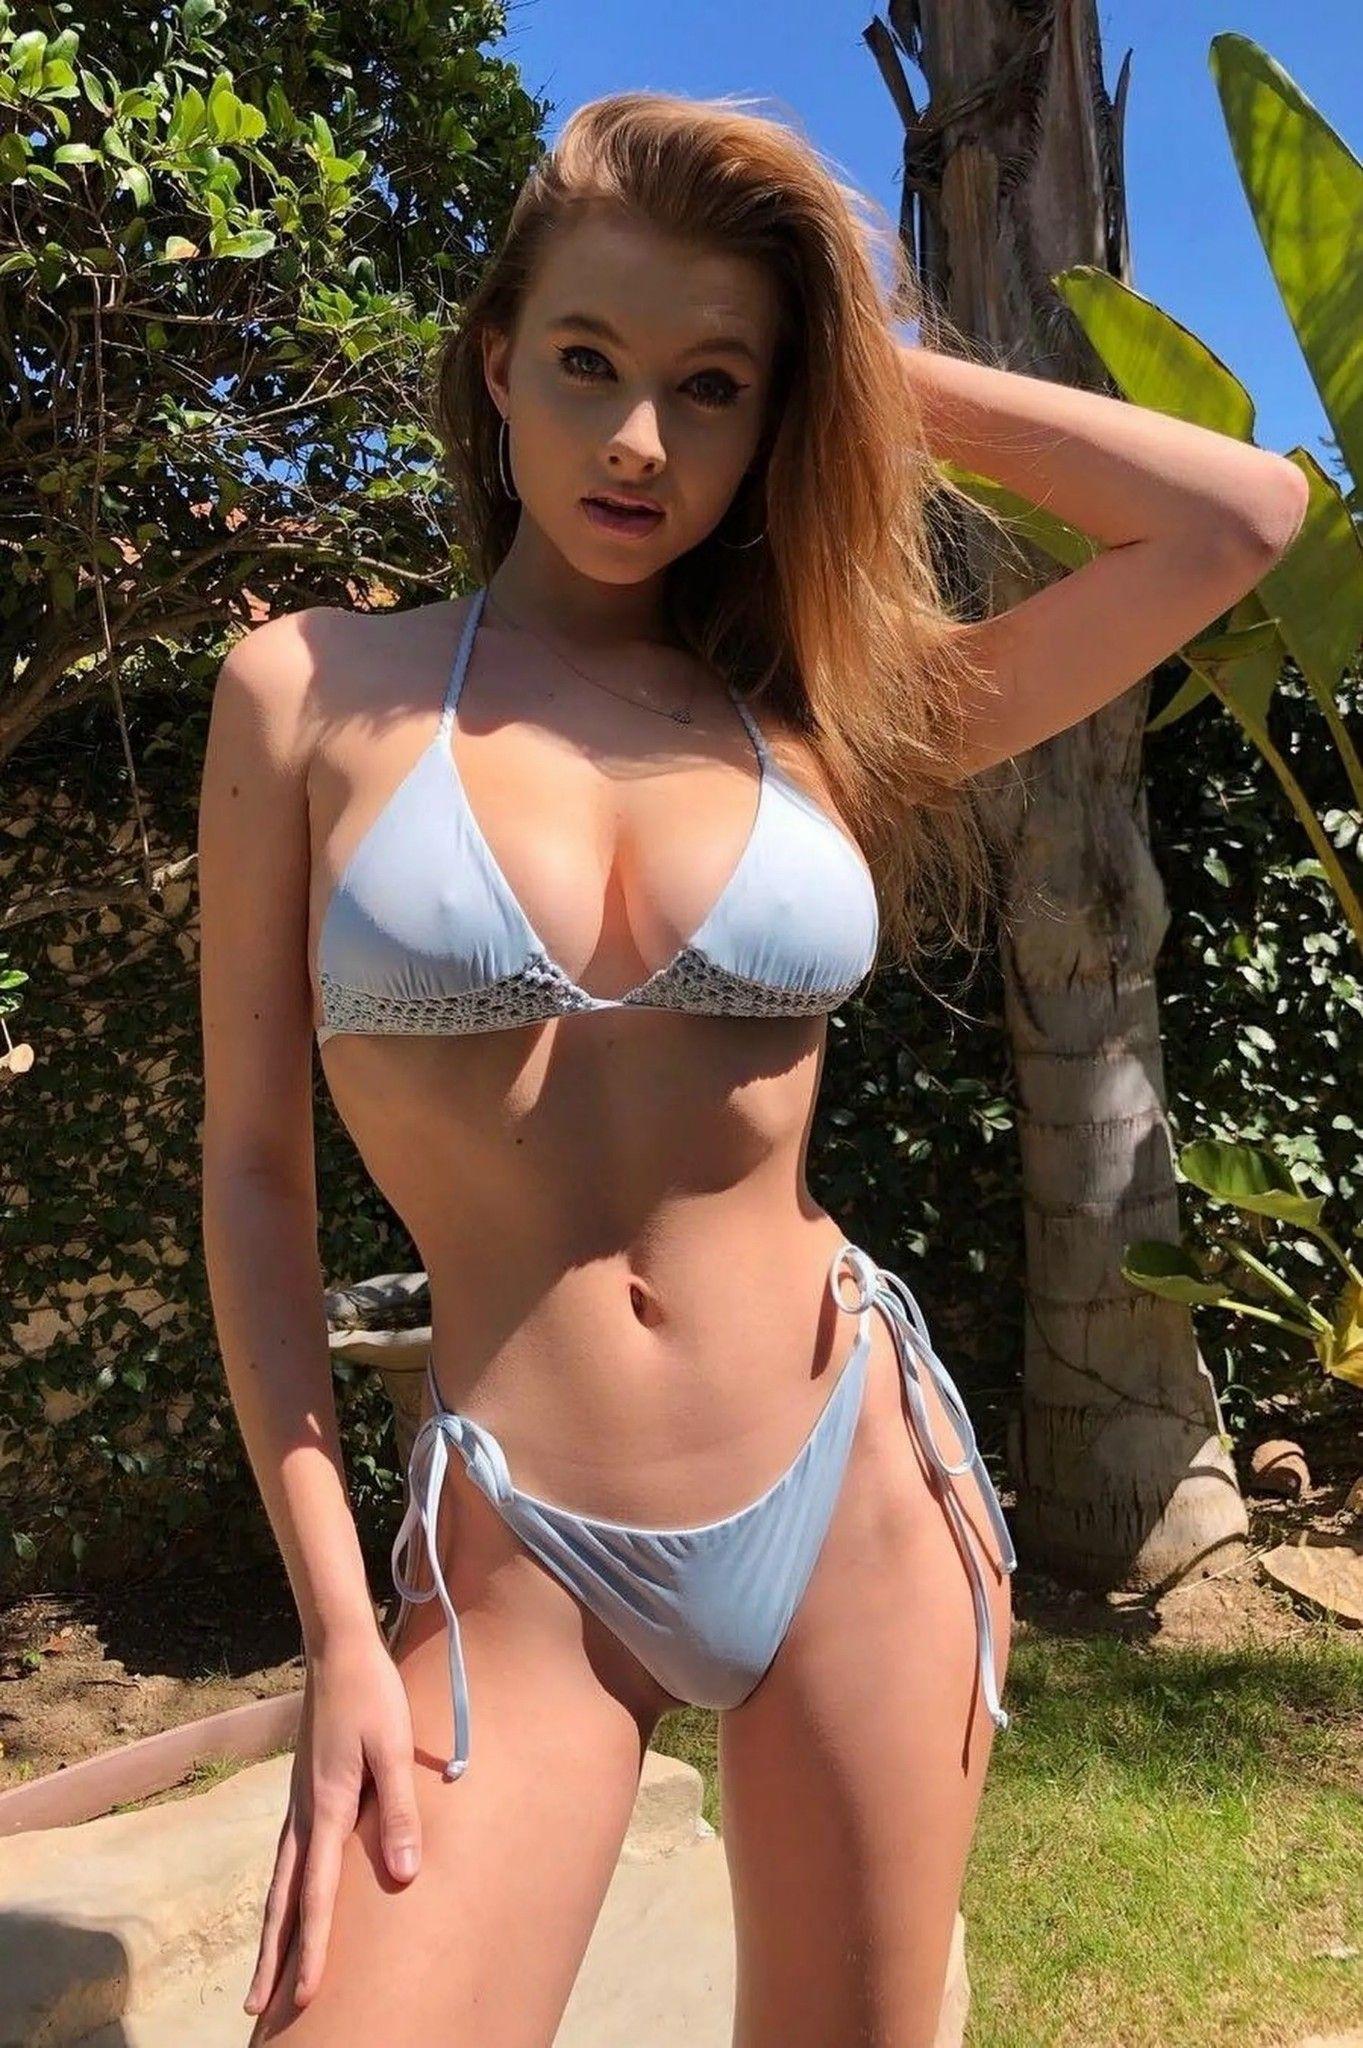 Pin Garcia Con Sexys 2019Chicas Bikini En De Moises vOm8wyNn0